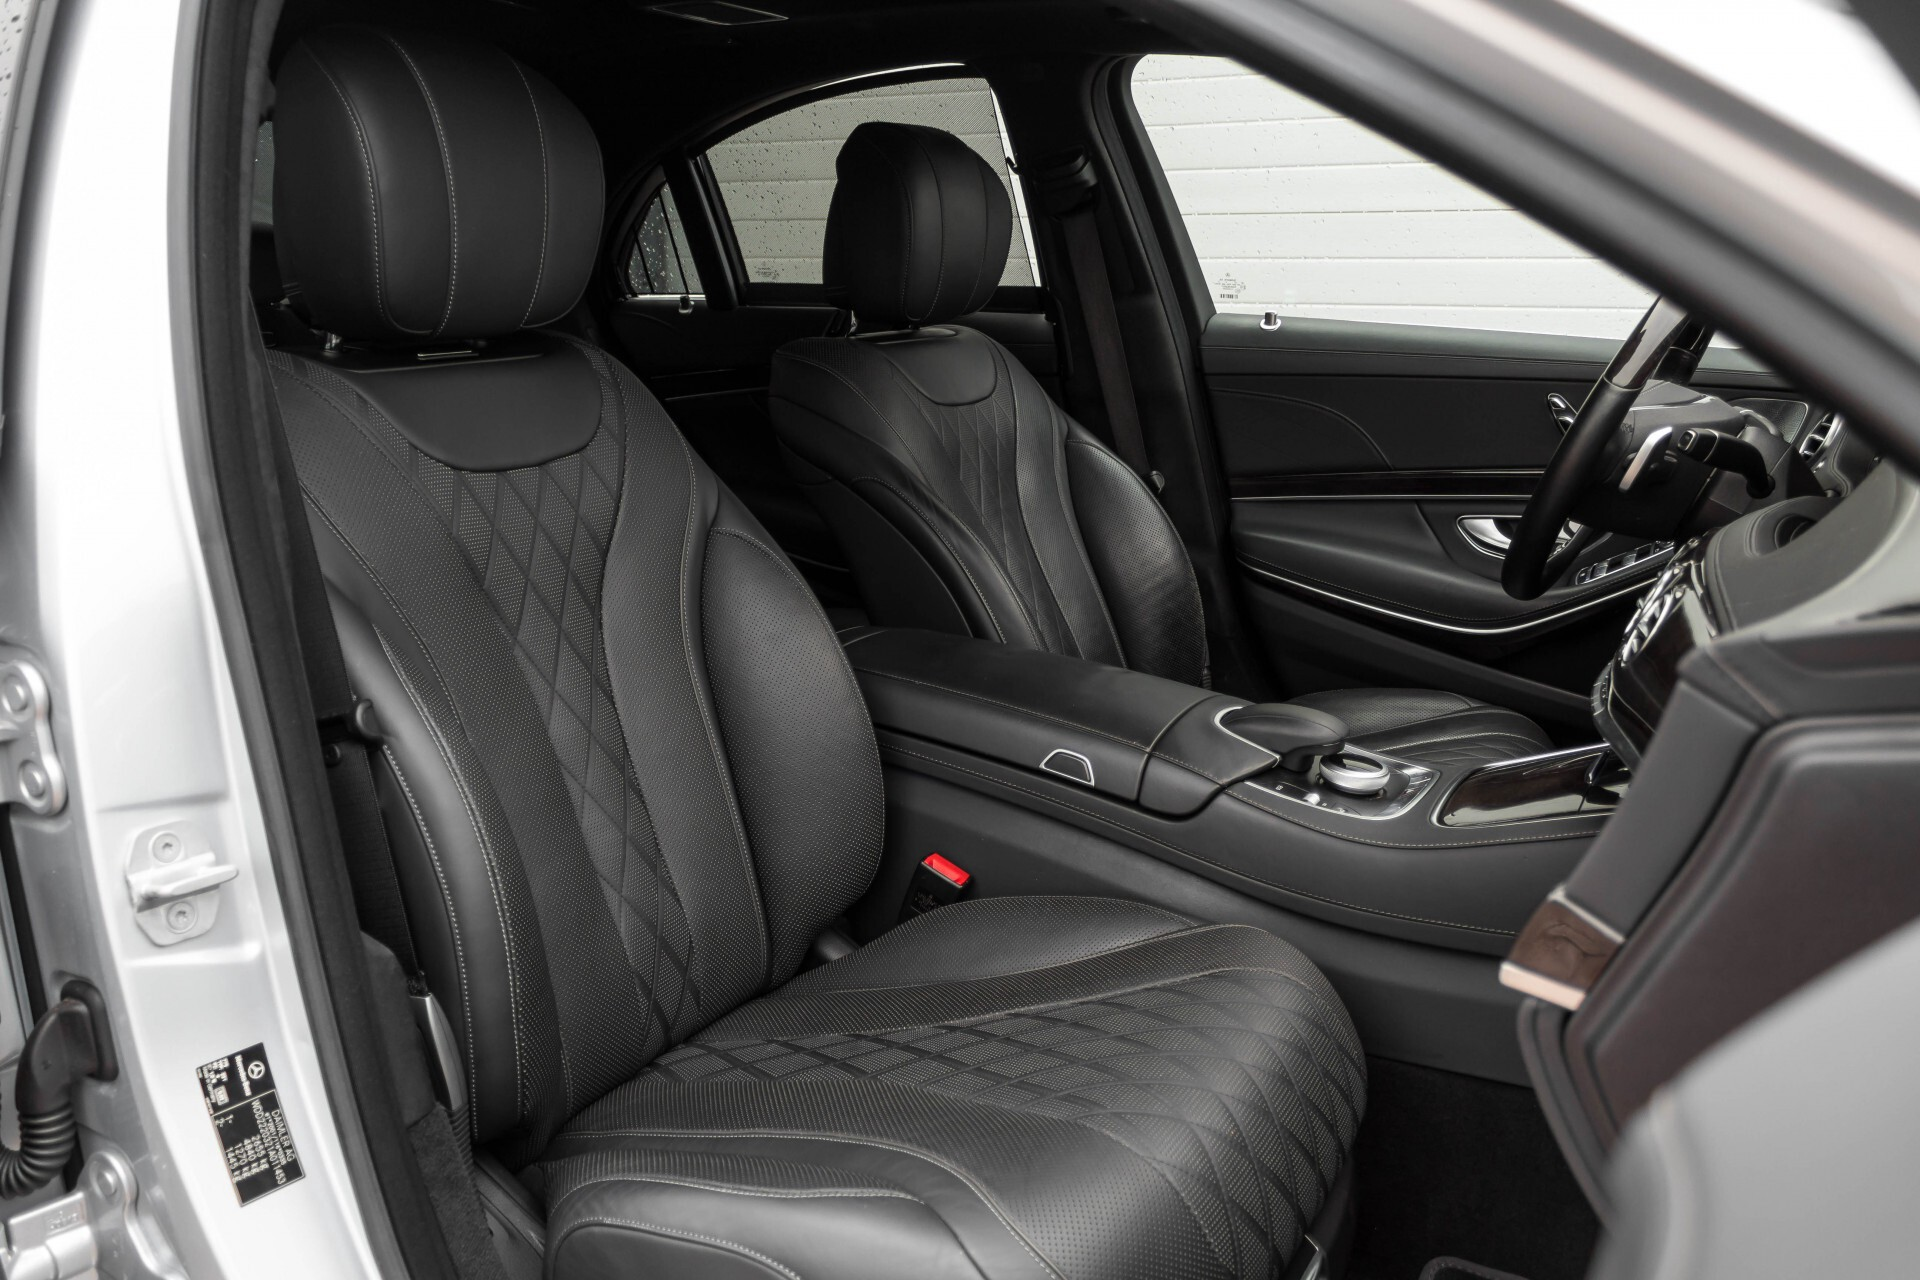 Mercedes-Benz S-Klasse 350 Bluetec Exclusive Panorama/Massage/Keyless/Distronic/Standkachel Aut7 Foto 3